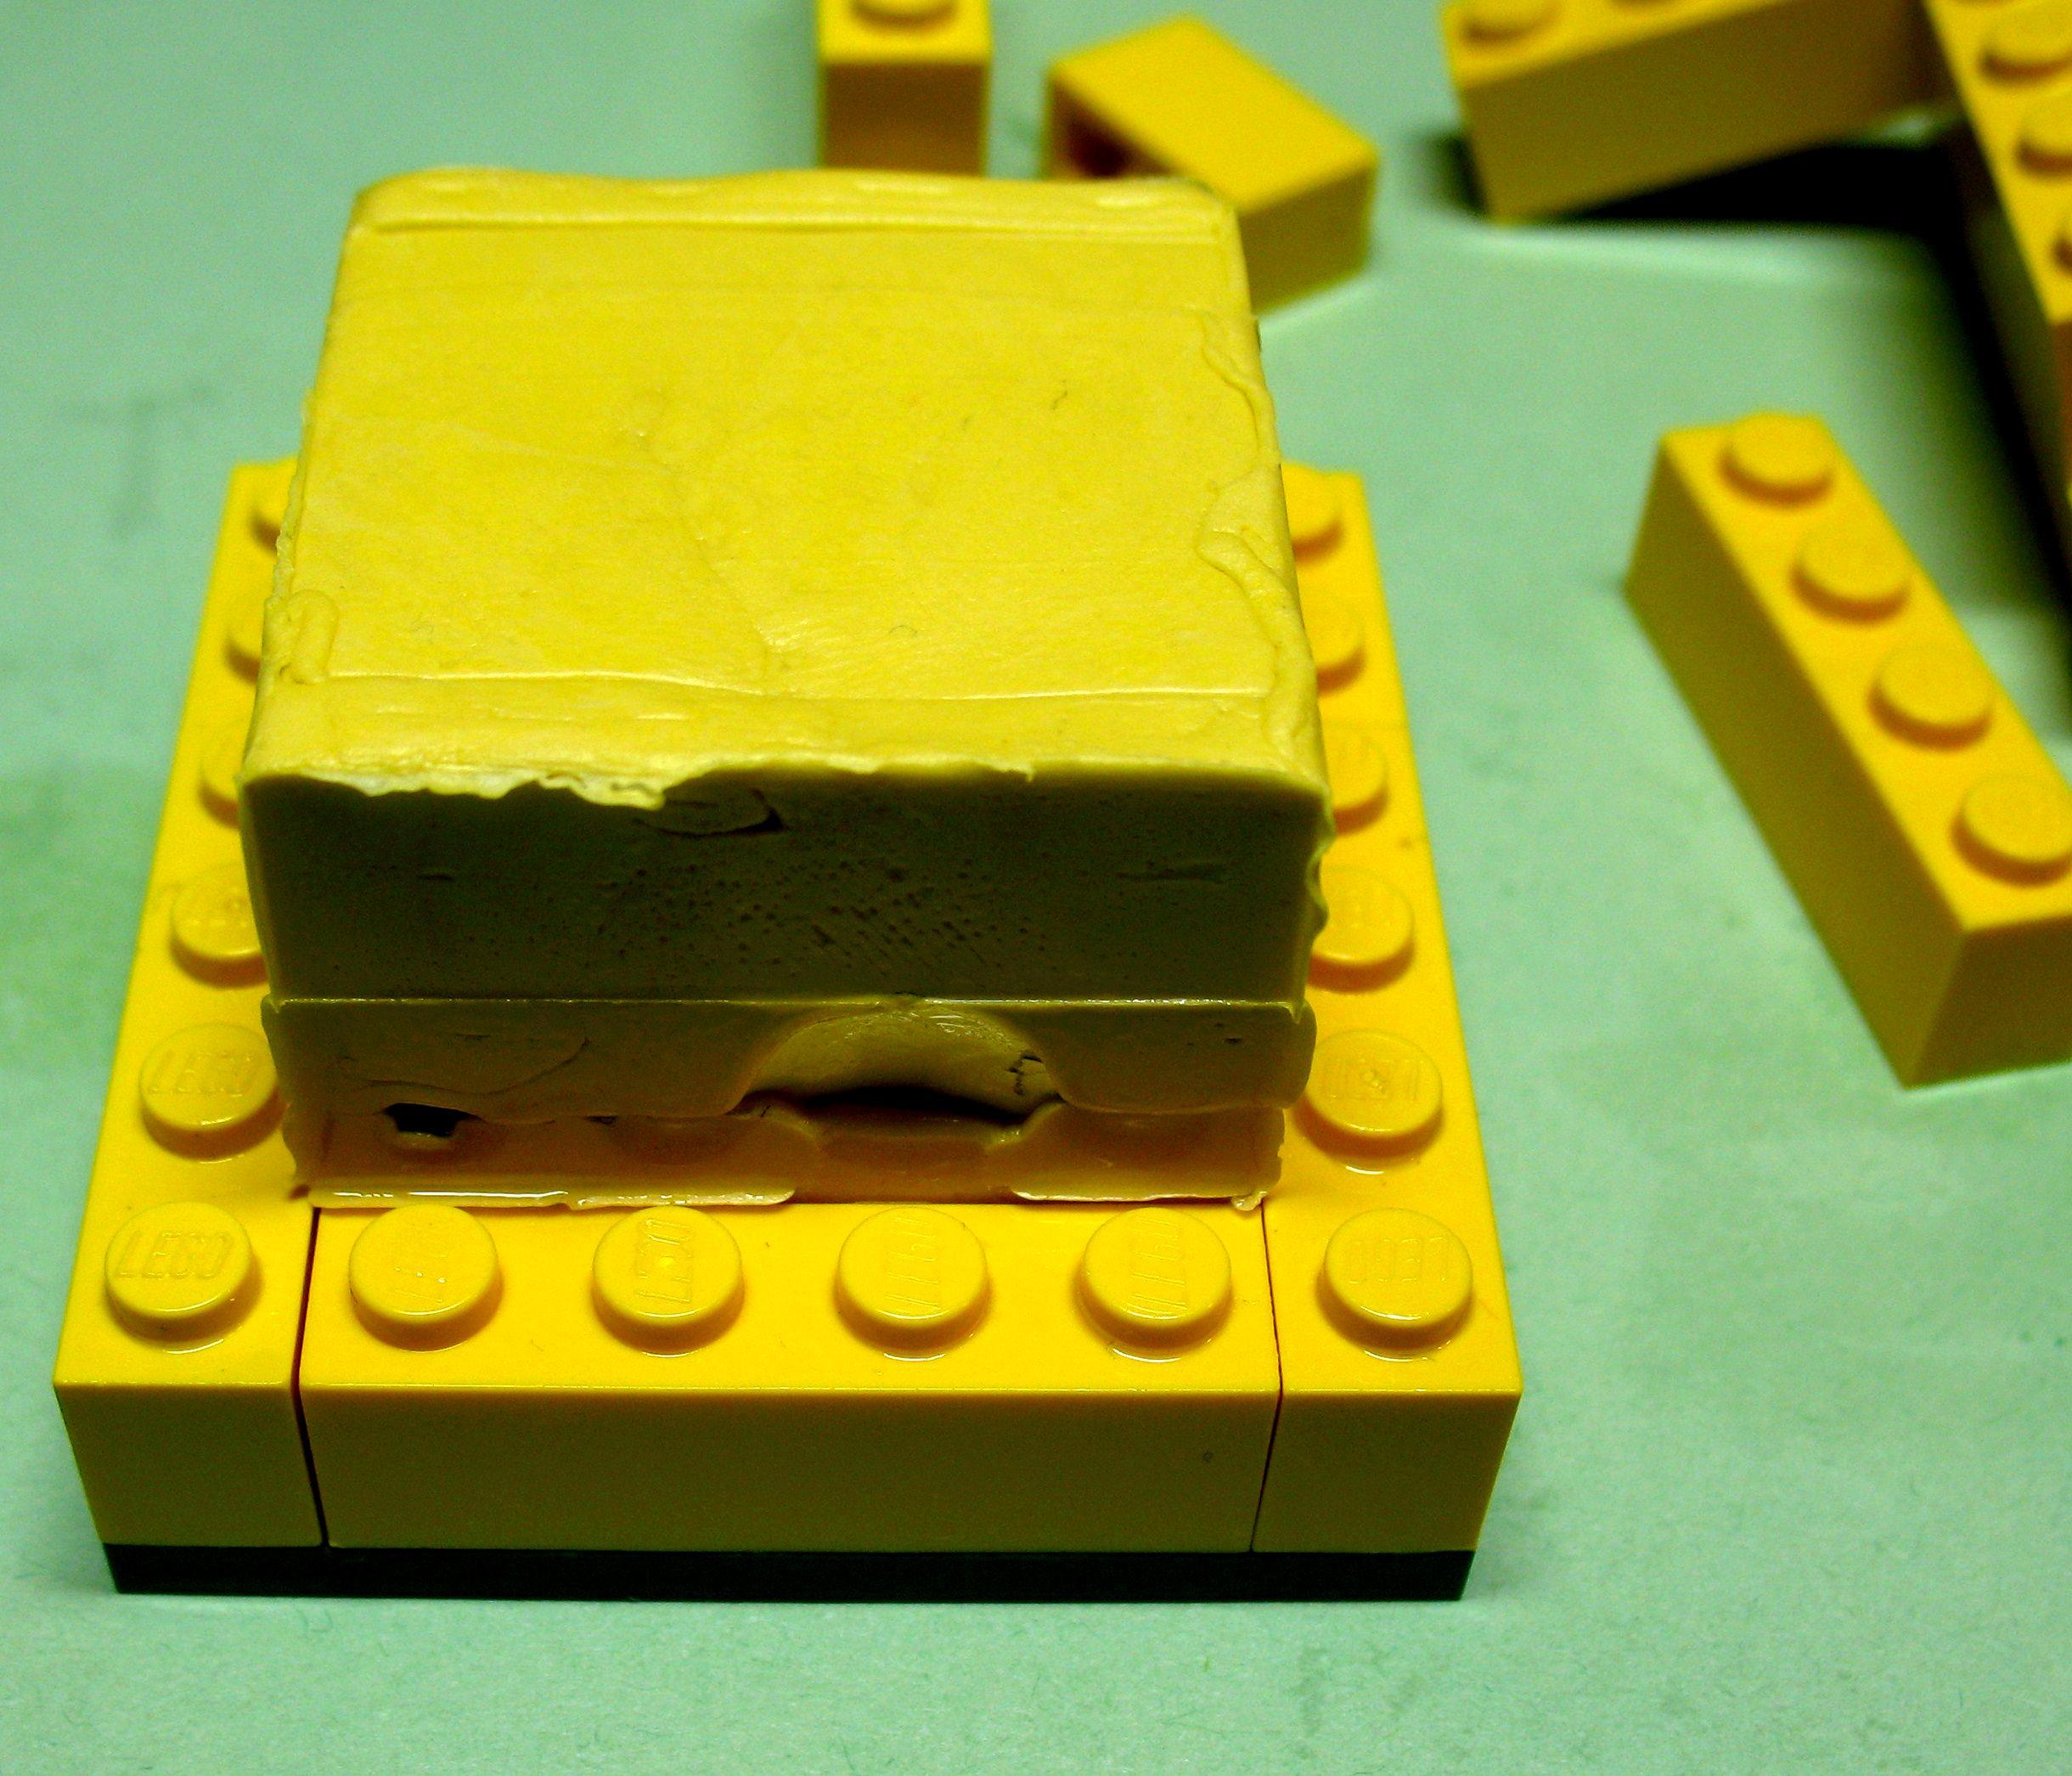 Alumilite, Casting, Mold, Resin